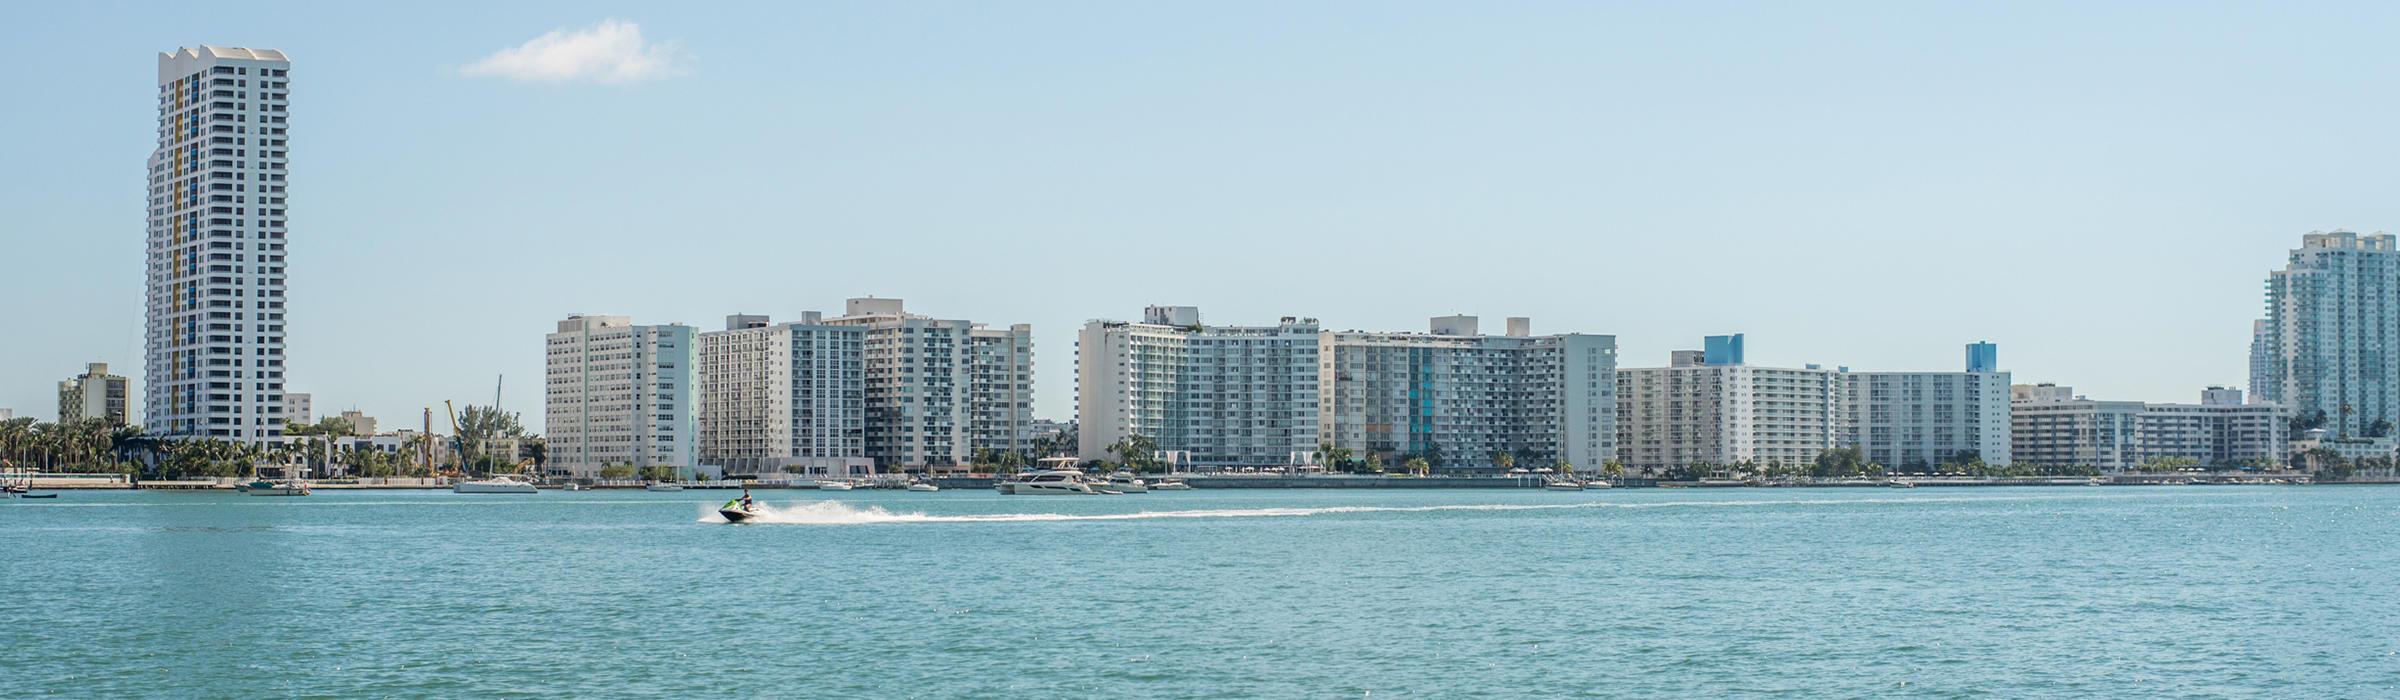 BouYah Watersports - Hilton Clearwater image 1